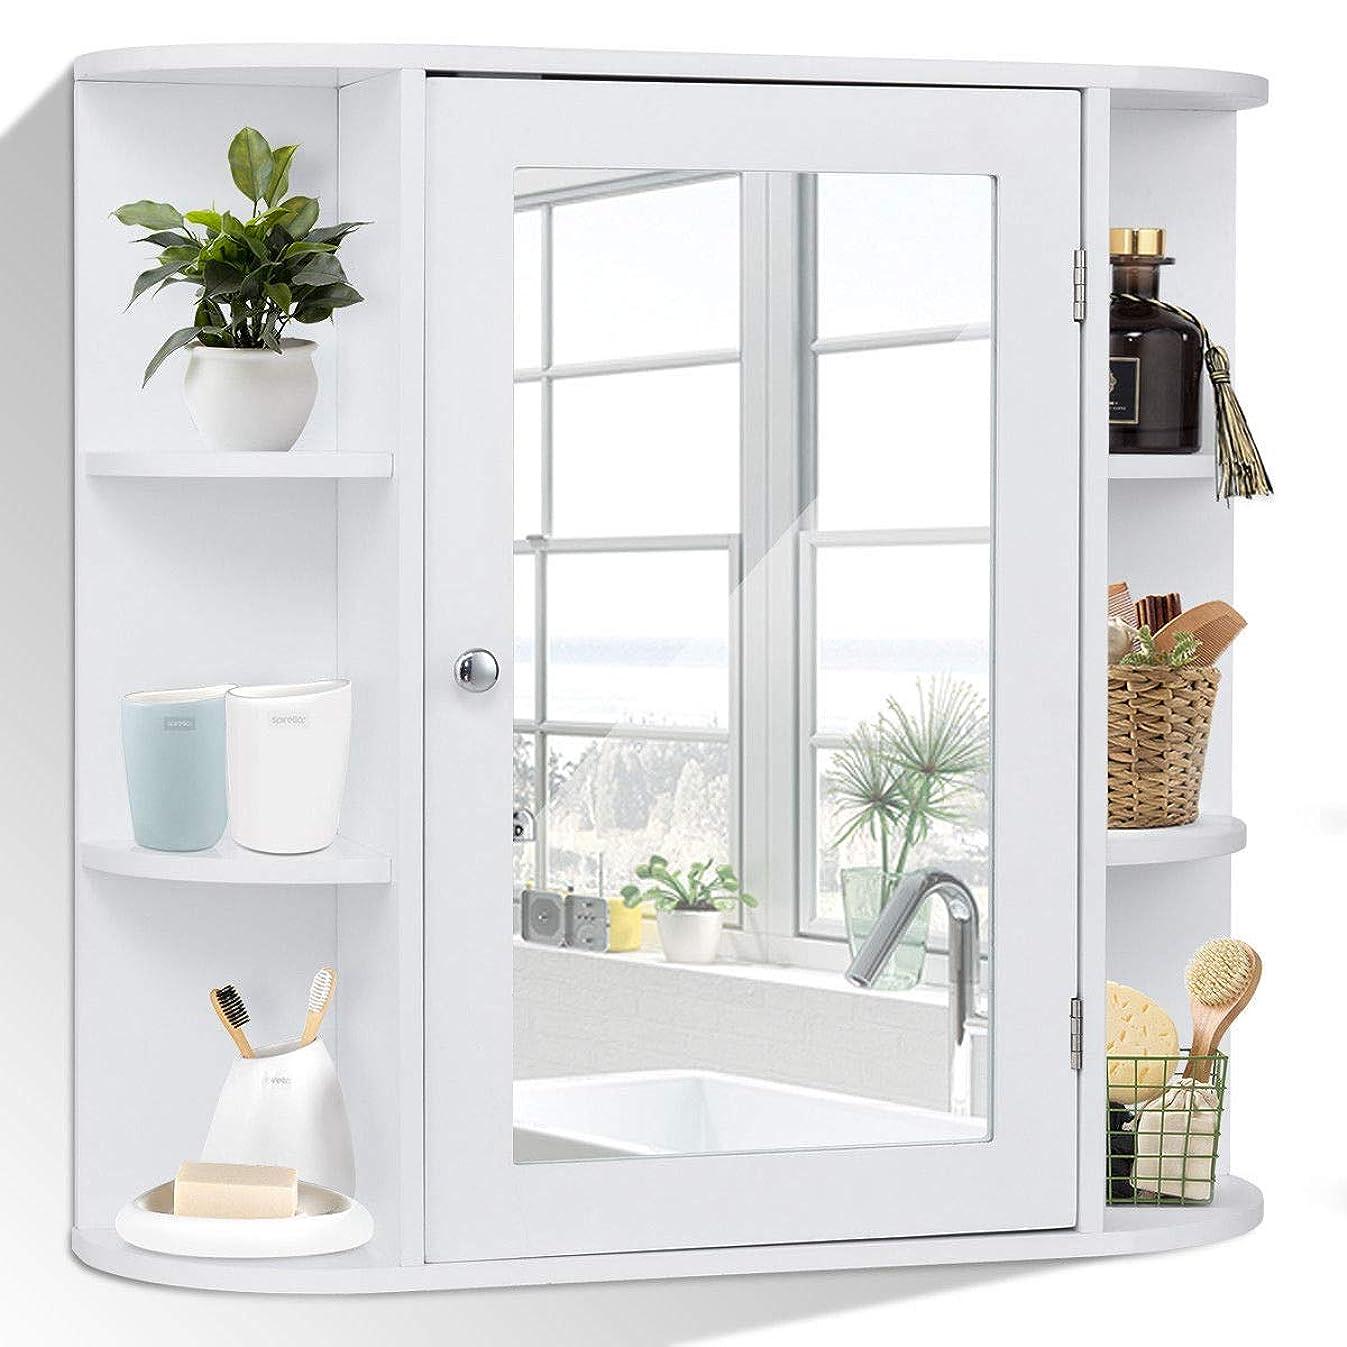 Tangkula Bathroom Cabinet Single Door Wall Mount with Mirror Organizer Storage Cabinet(4 Tier Inner Shelves)